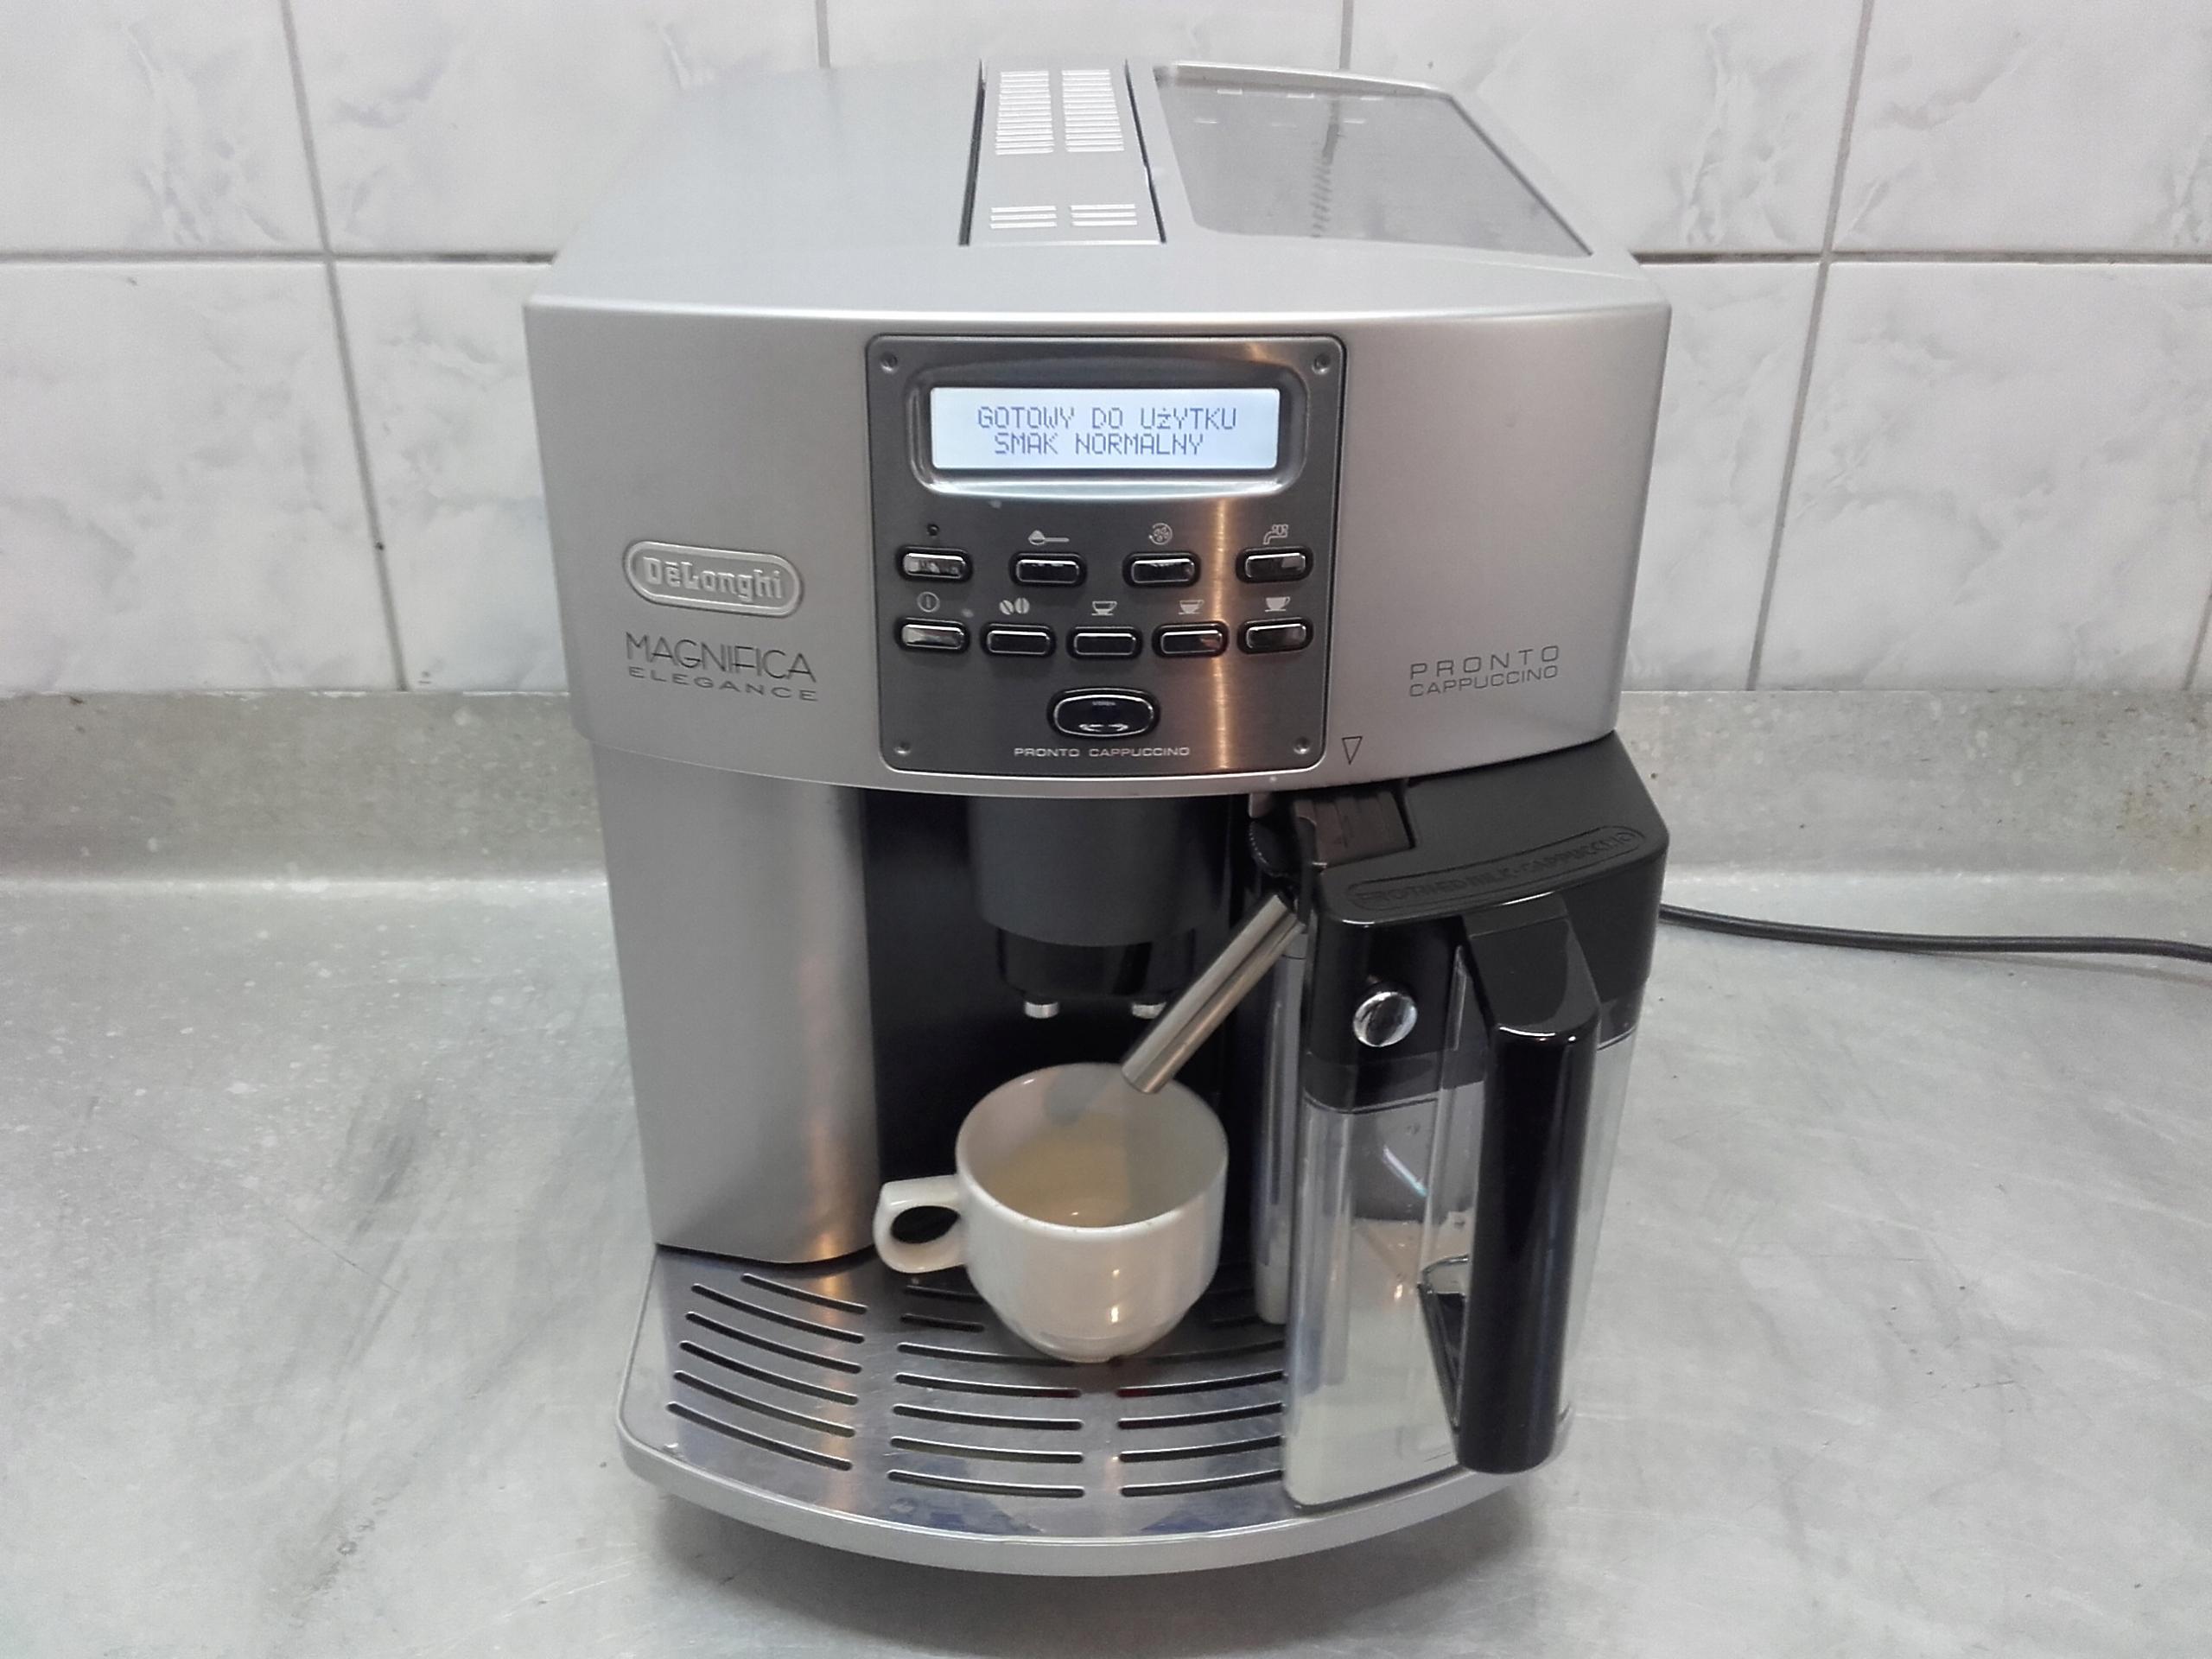 Ekspres delonghi esam 3500 cappuccino .Polski jęz.